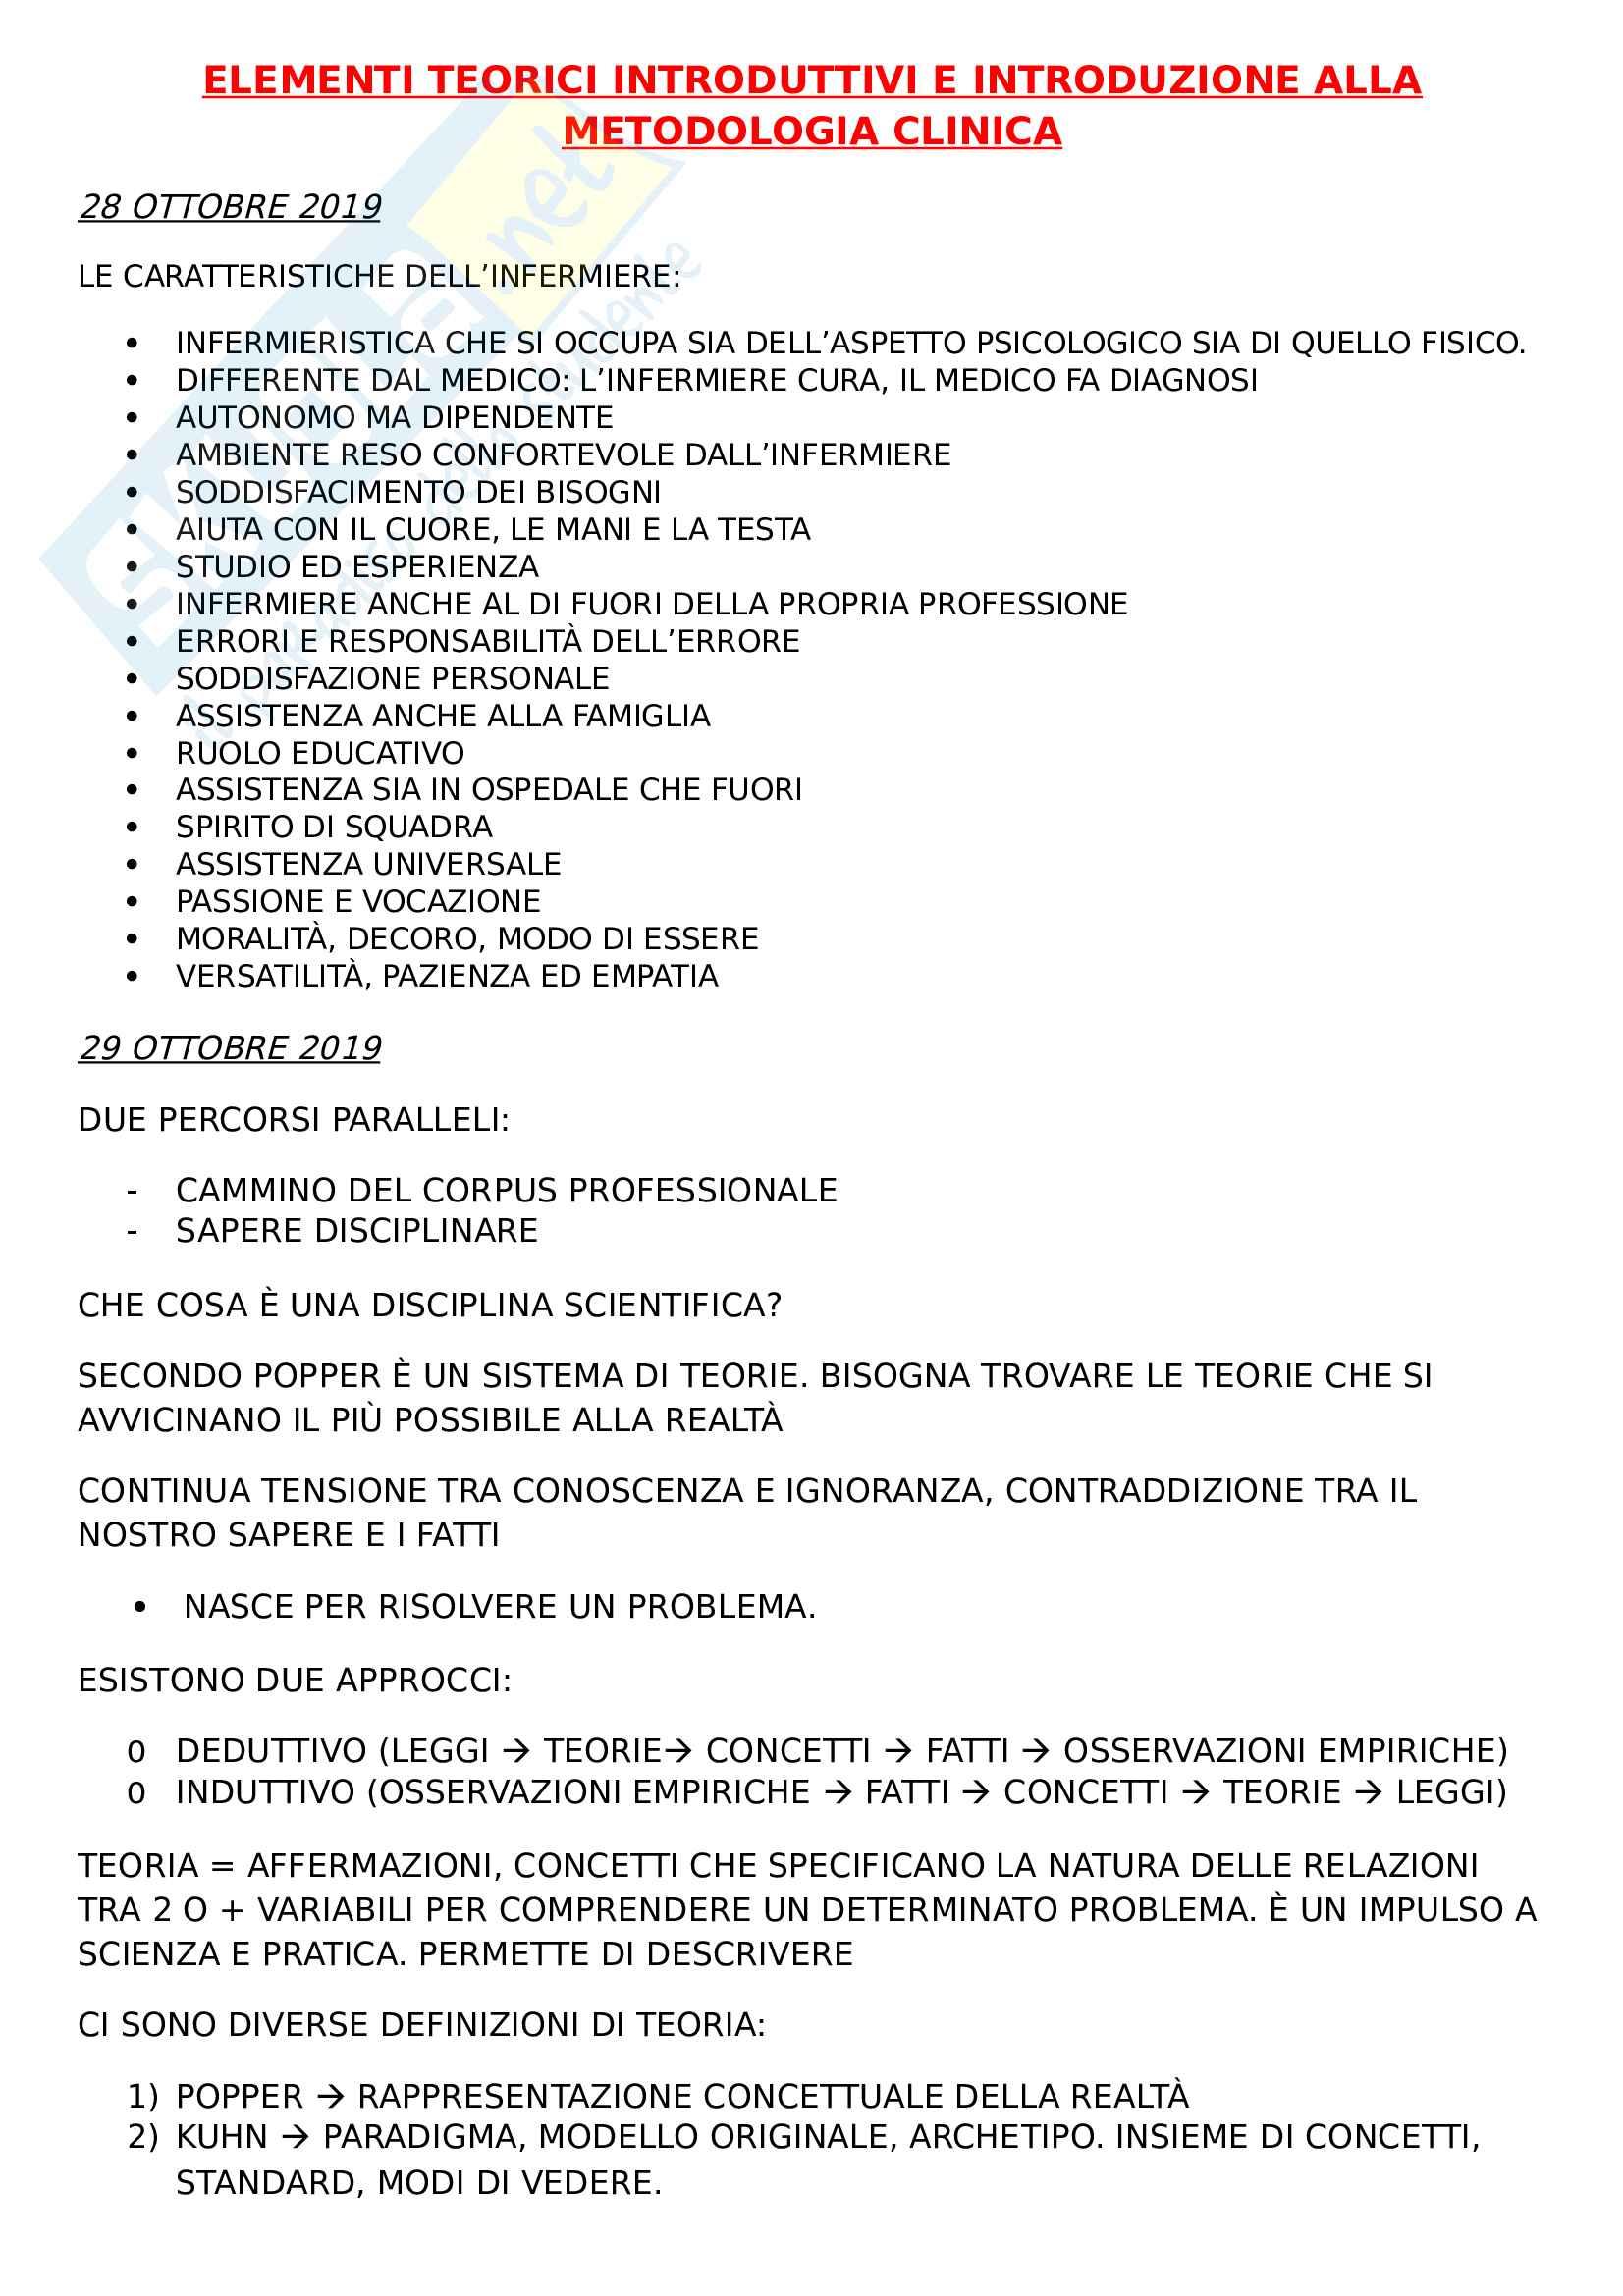 Elementi teorici introduttivi e introduzione alla metodologia clinica